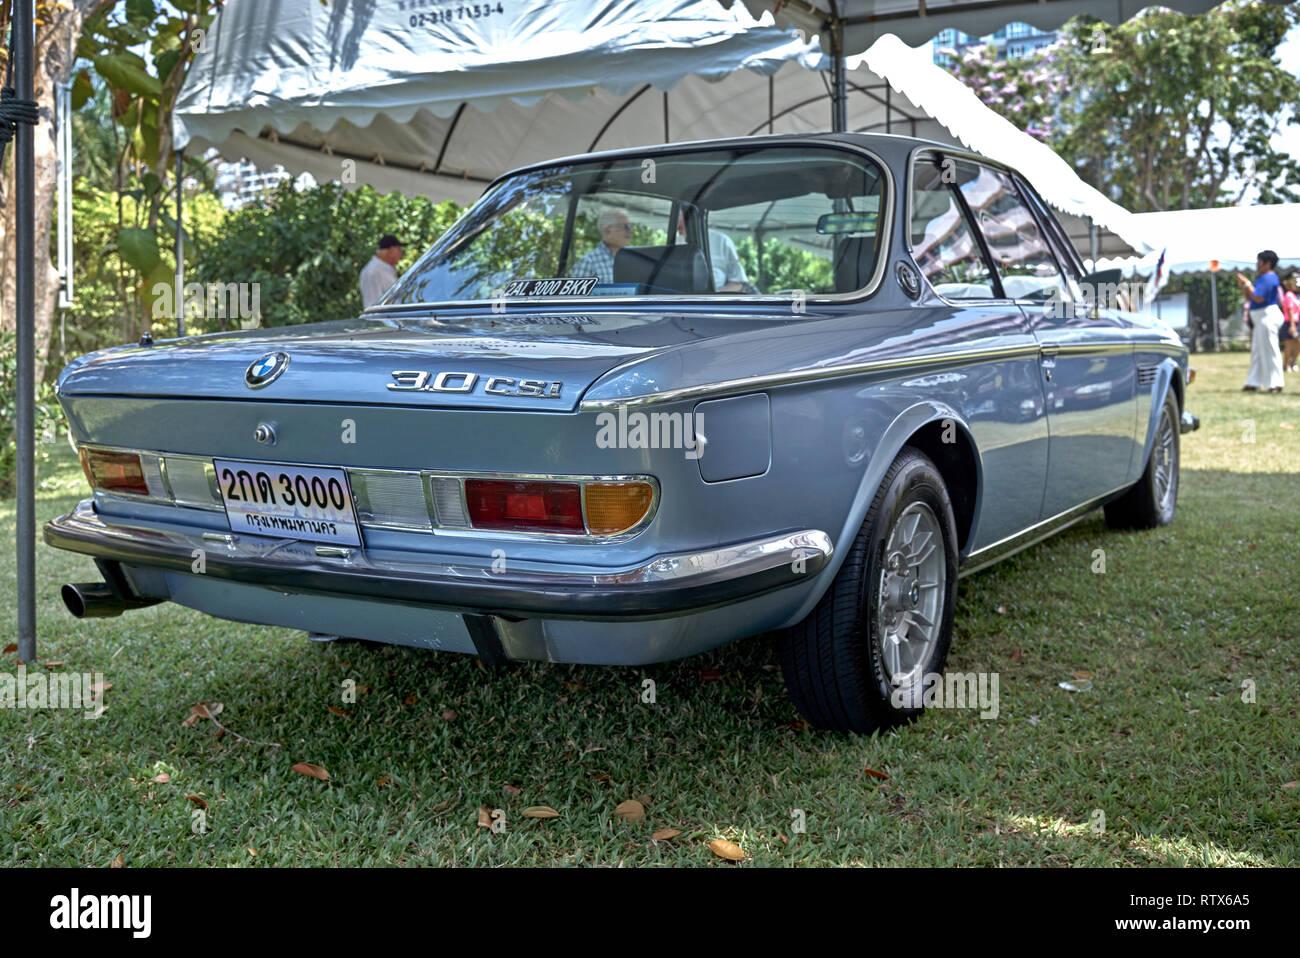 BMW 3.0 CSI classic vintage 2 door sports saloon 1974 - Stock Image